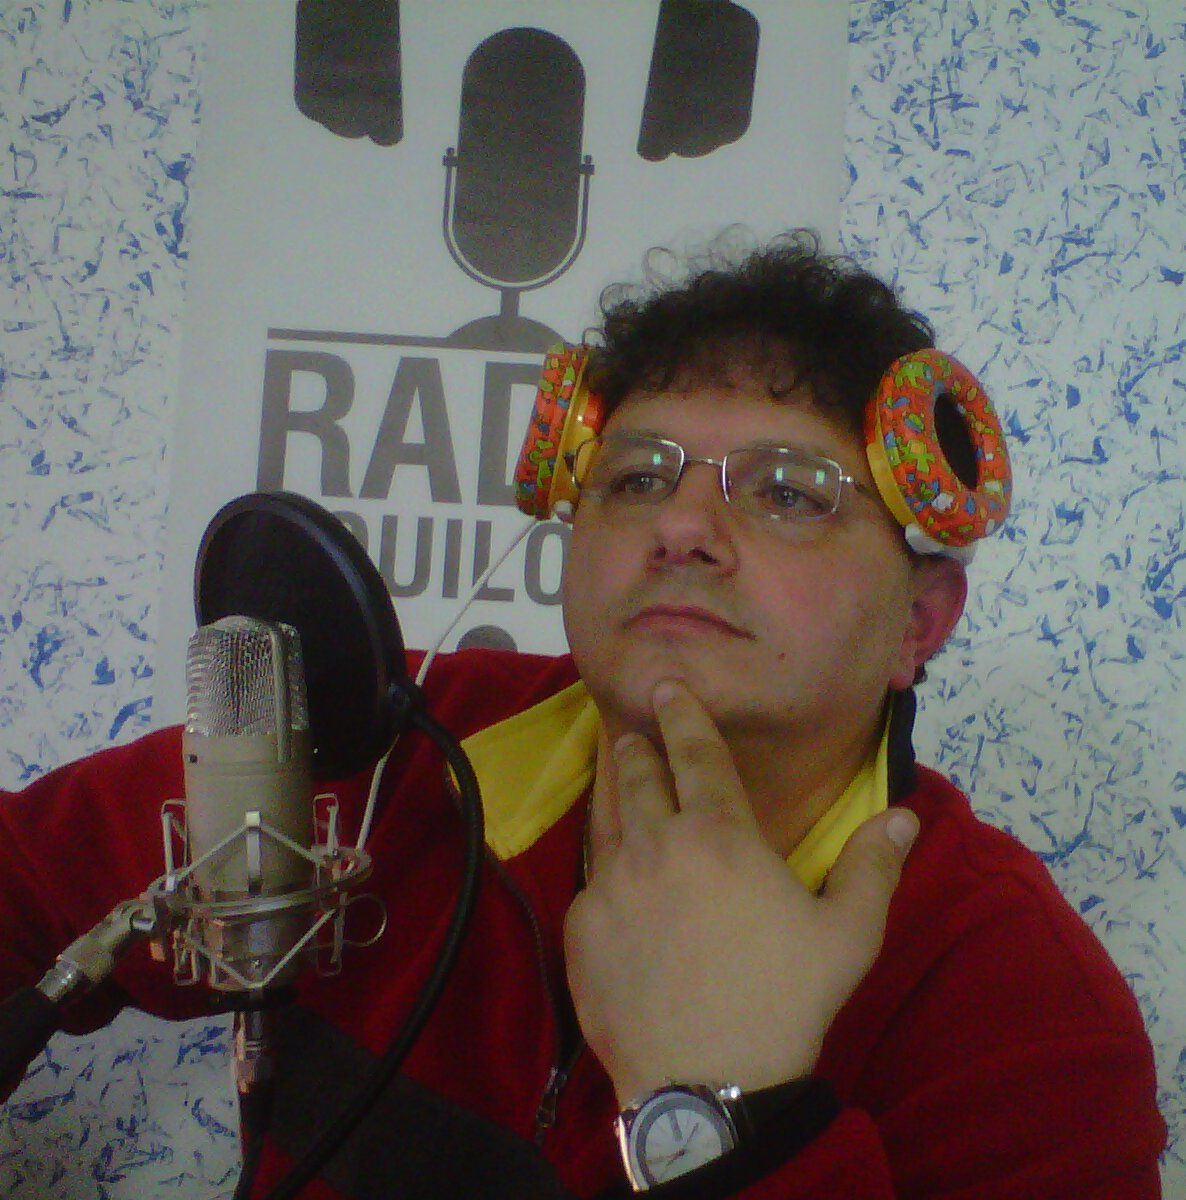 Valerio Balestrieri